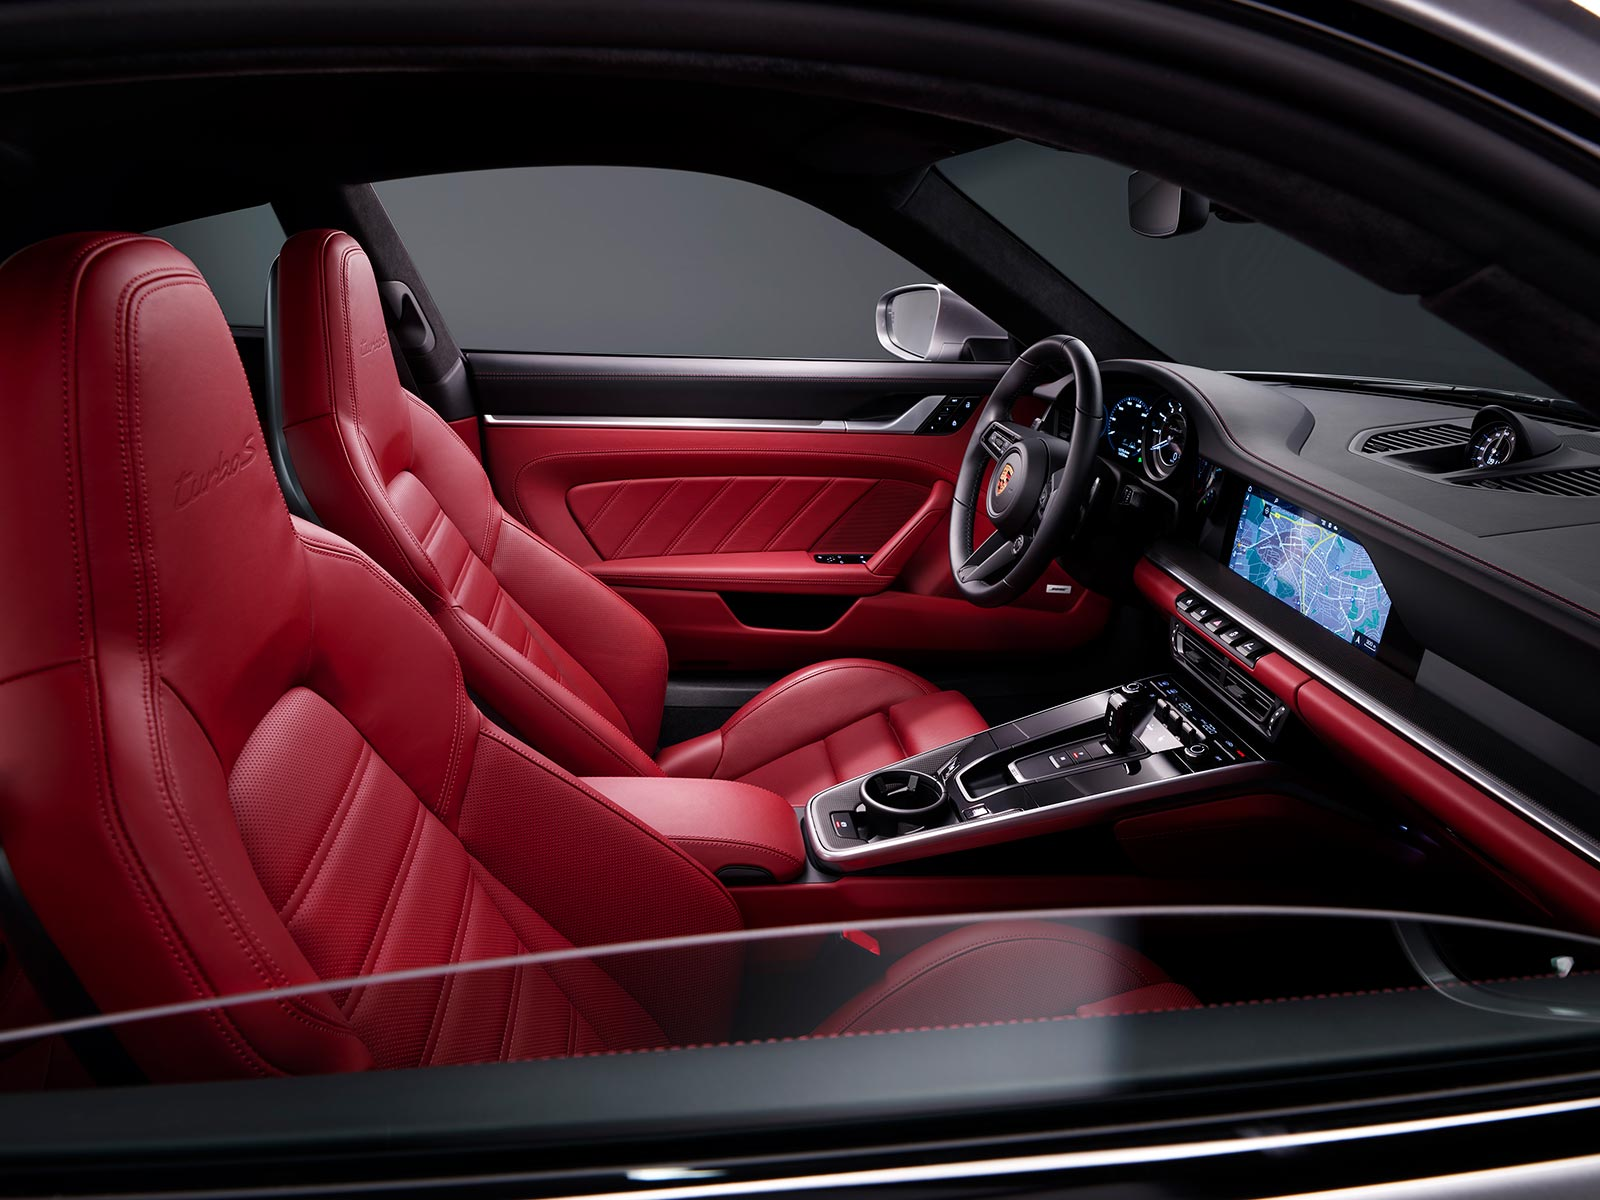 Interior Porsche 911 Turbo S (992)